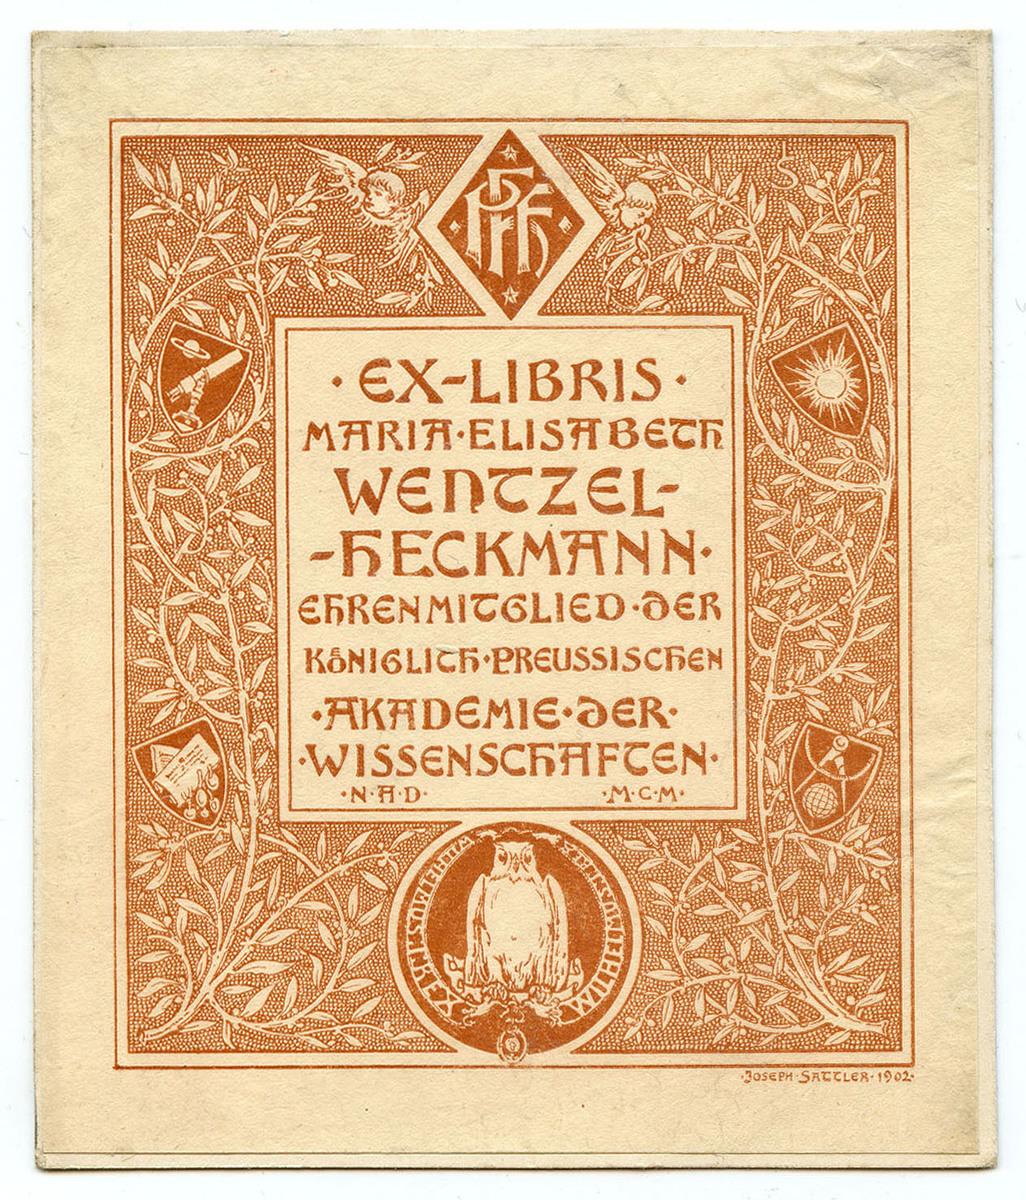 exlibris_0438.jpg